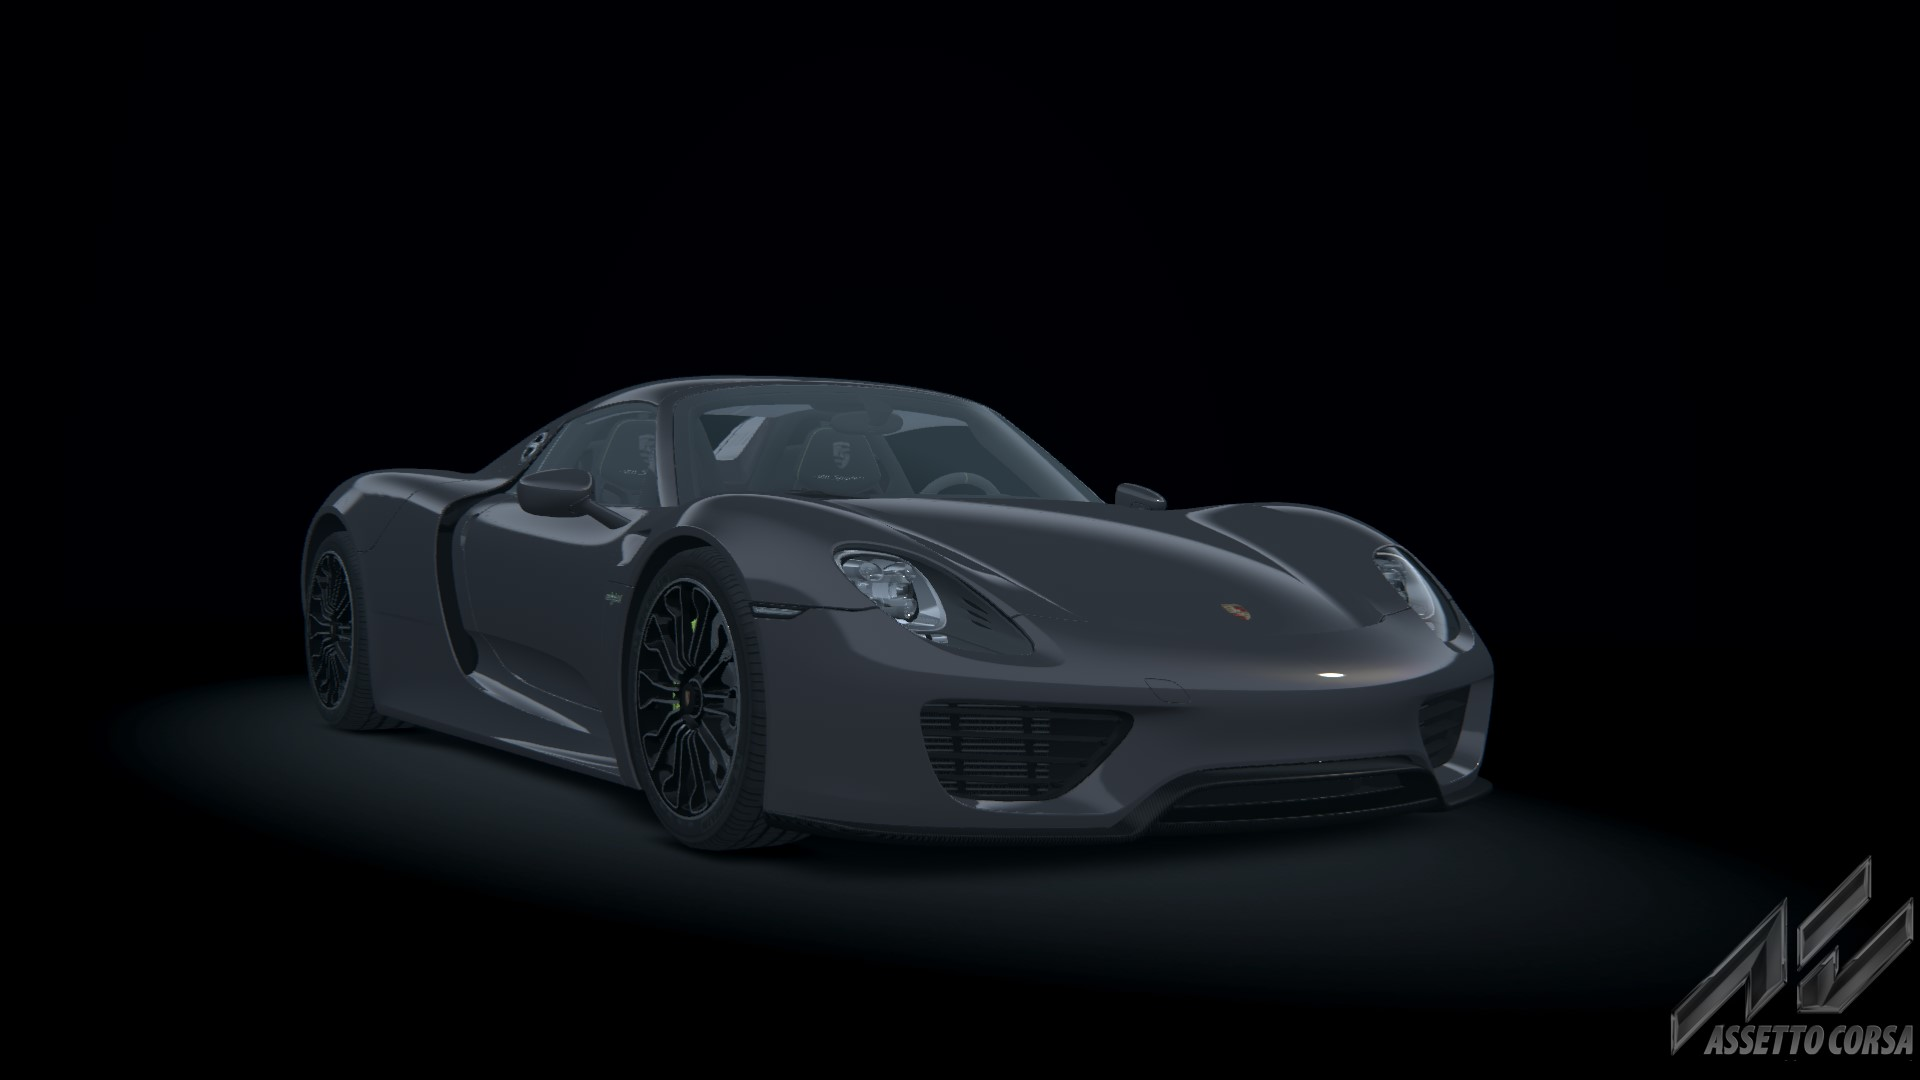 918 Spyder 4wd Porsche Car Detail Assetto Corsa Database